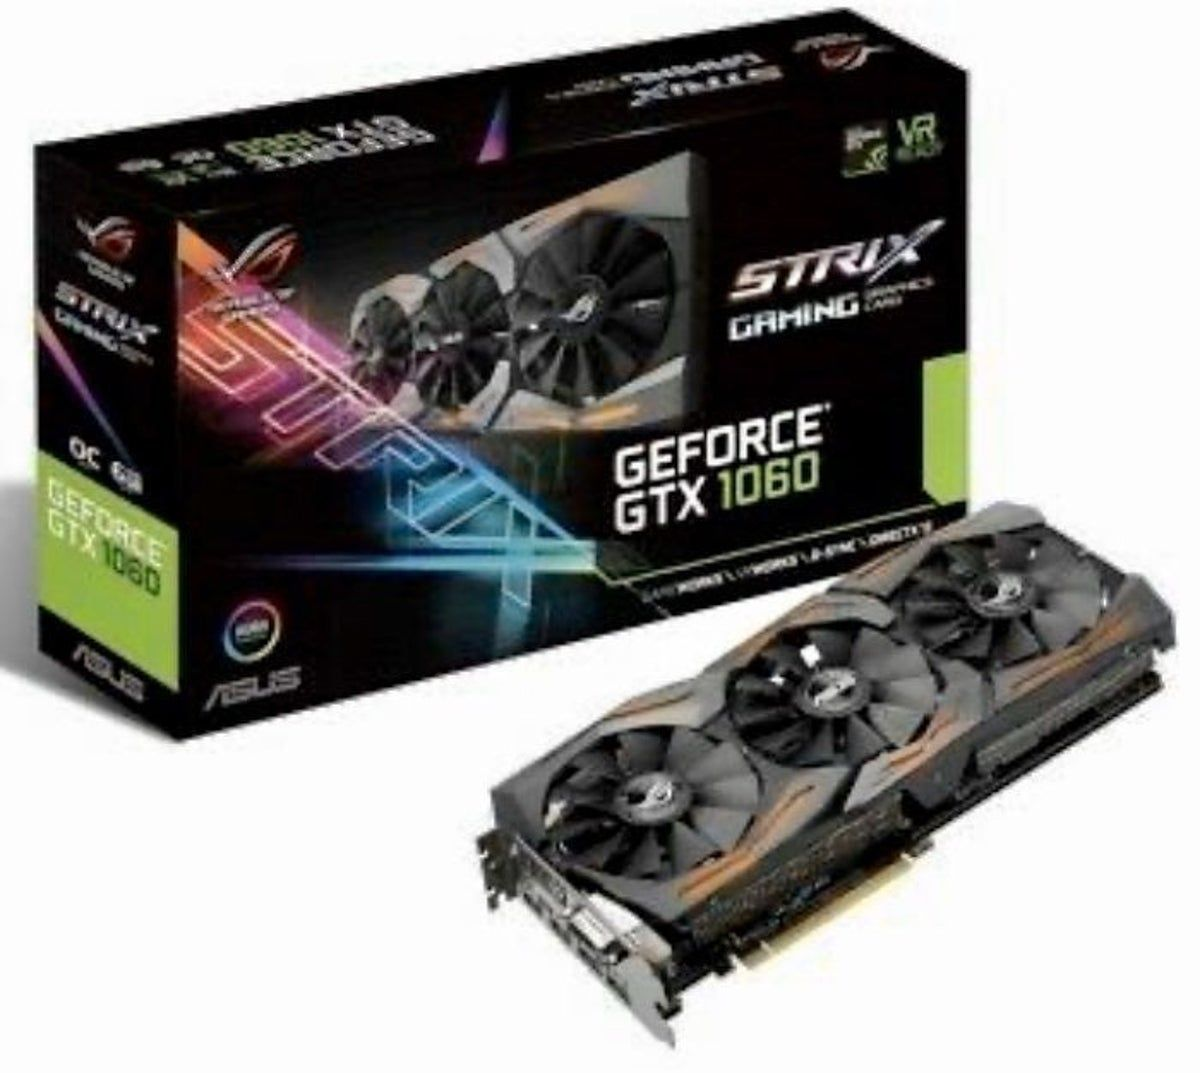 Asus Rog Strix Video Card Geforce1060 Graphic Card Asus Asus Rog